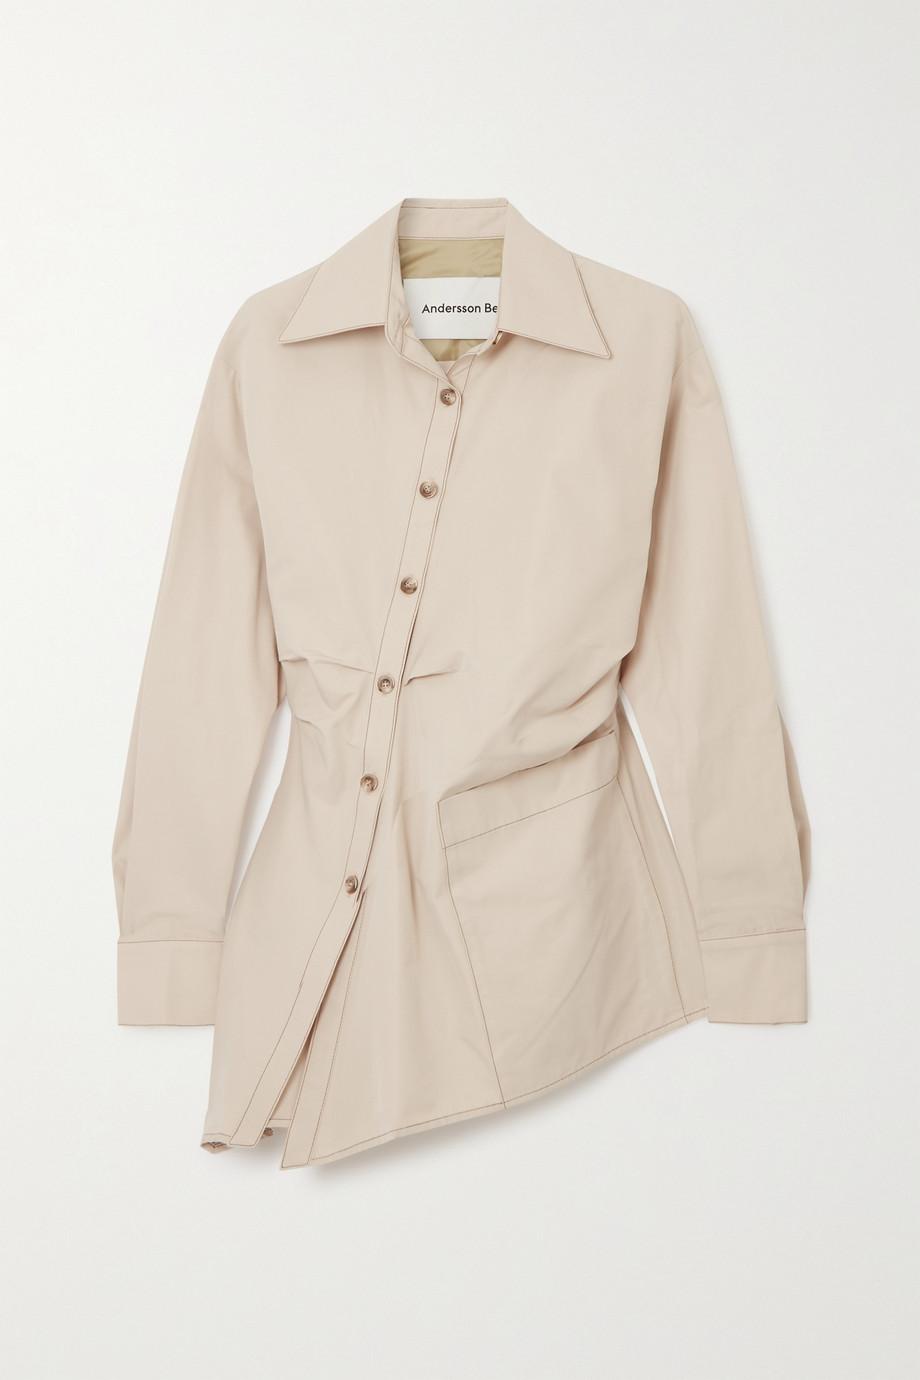 Andersson Bell Ryley asymmetric cotton-blend shirt